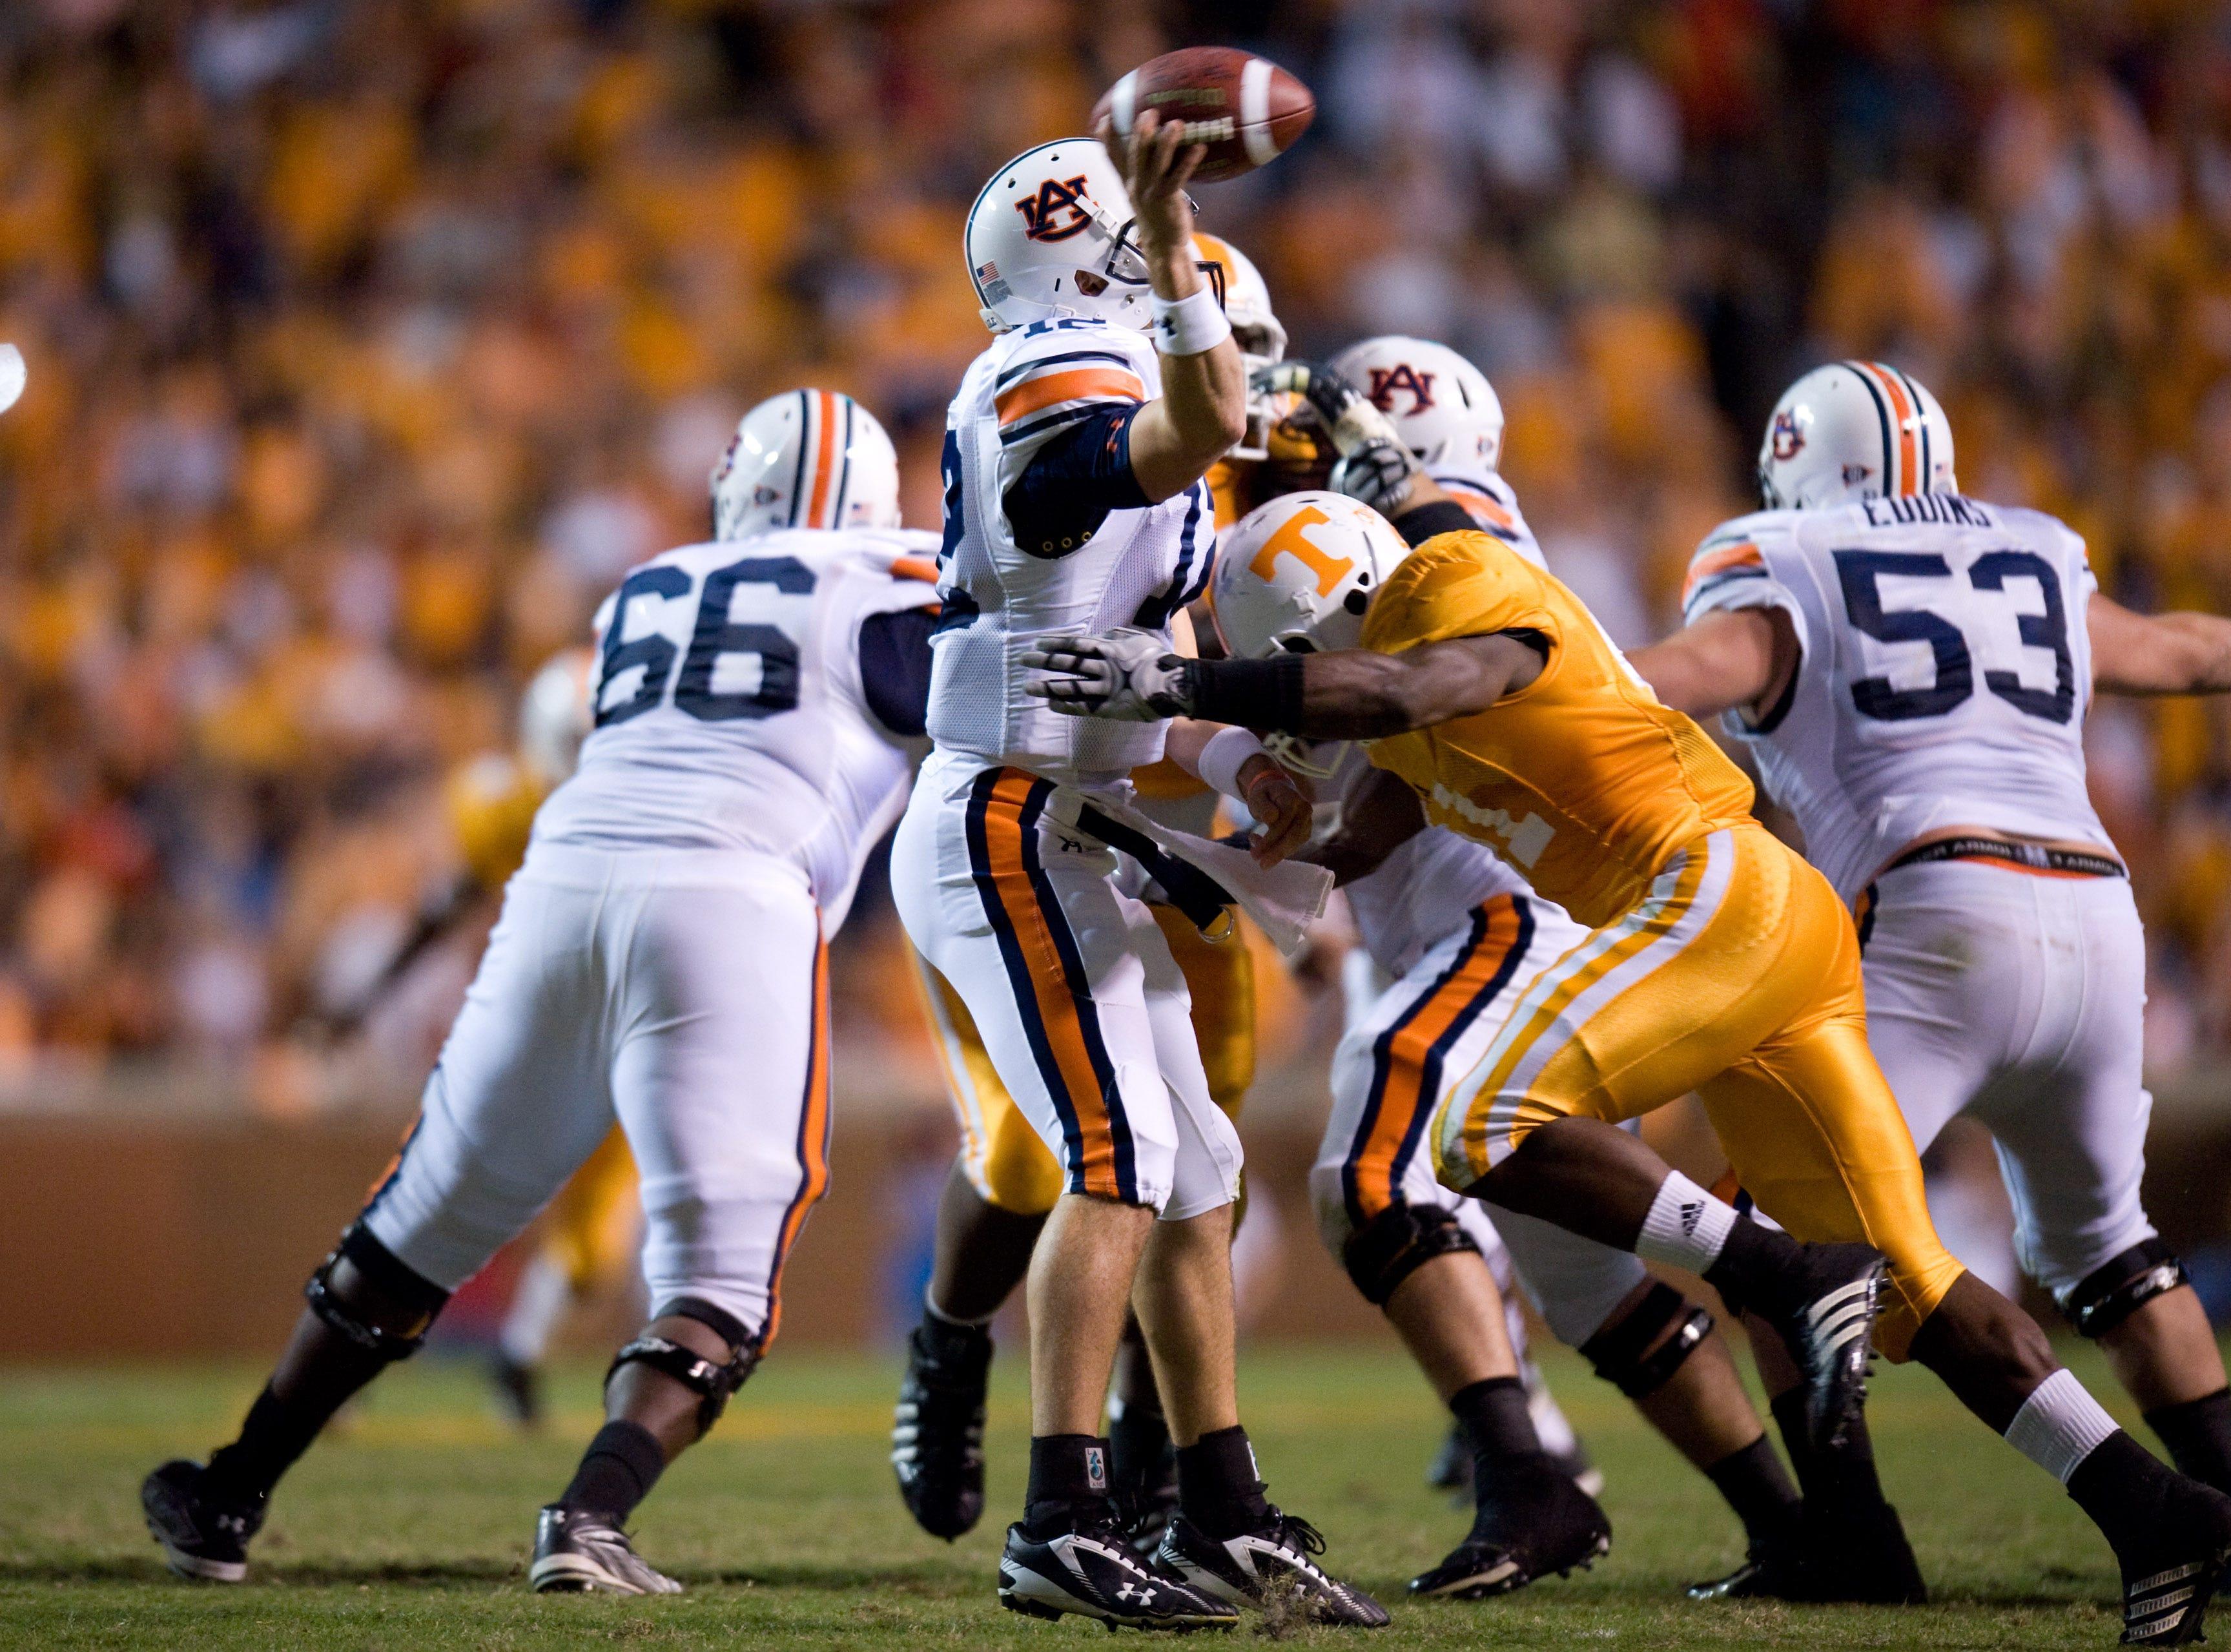 Tennessee cornerback Dennis Rogan (41) hits Auburn quarterback Chris Todd (12) on Saturday, Oct. 3, 2009 at Neyland Stadium.